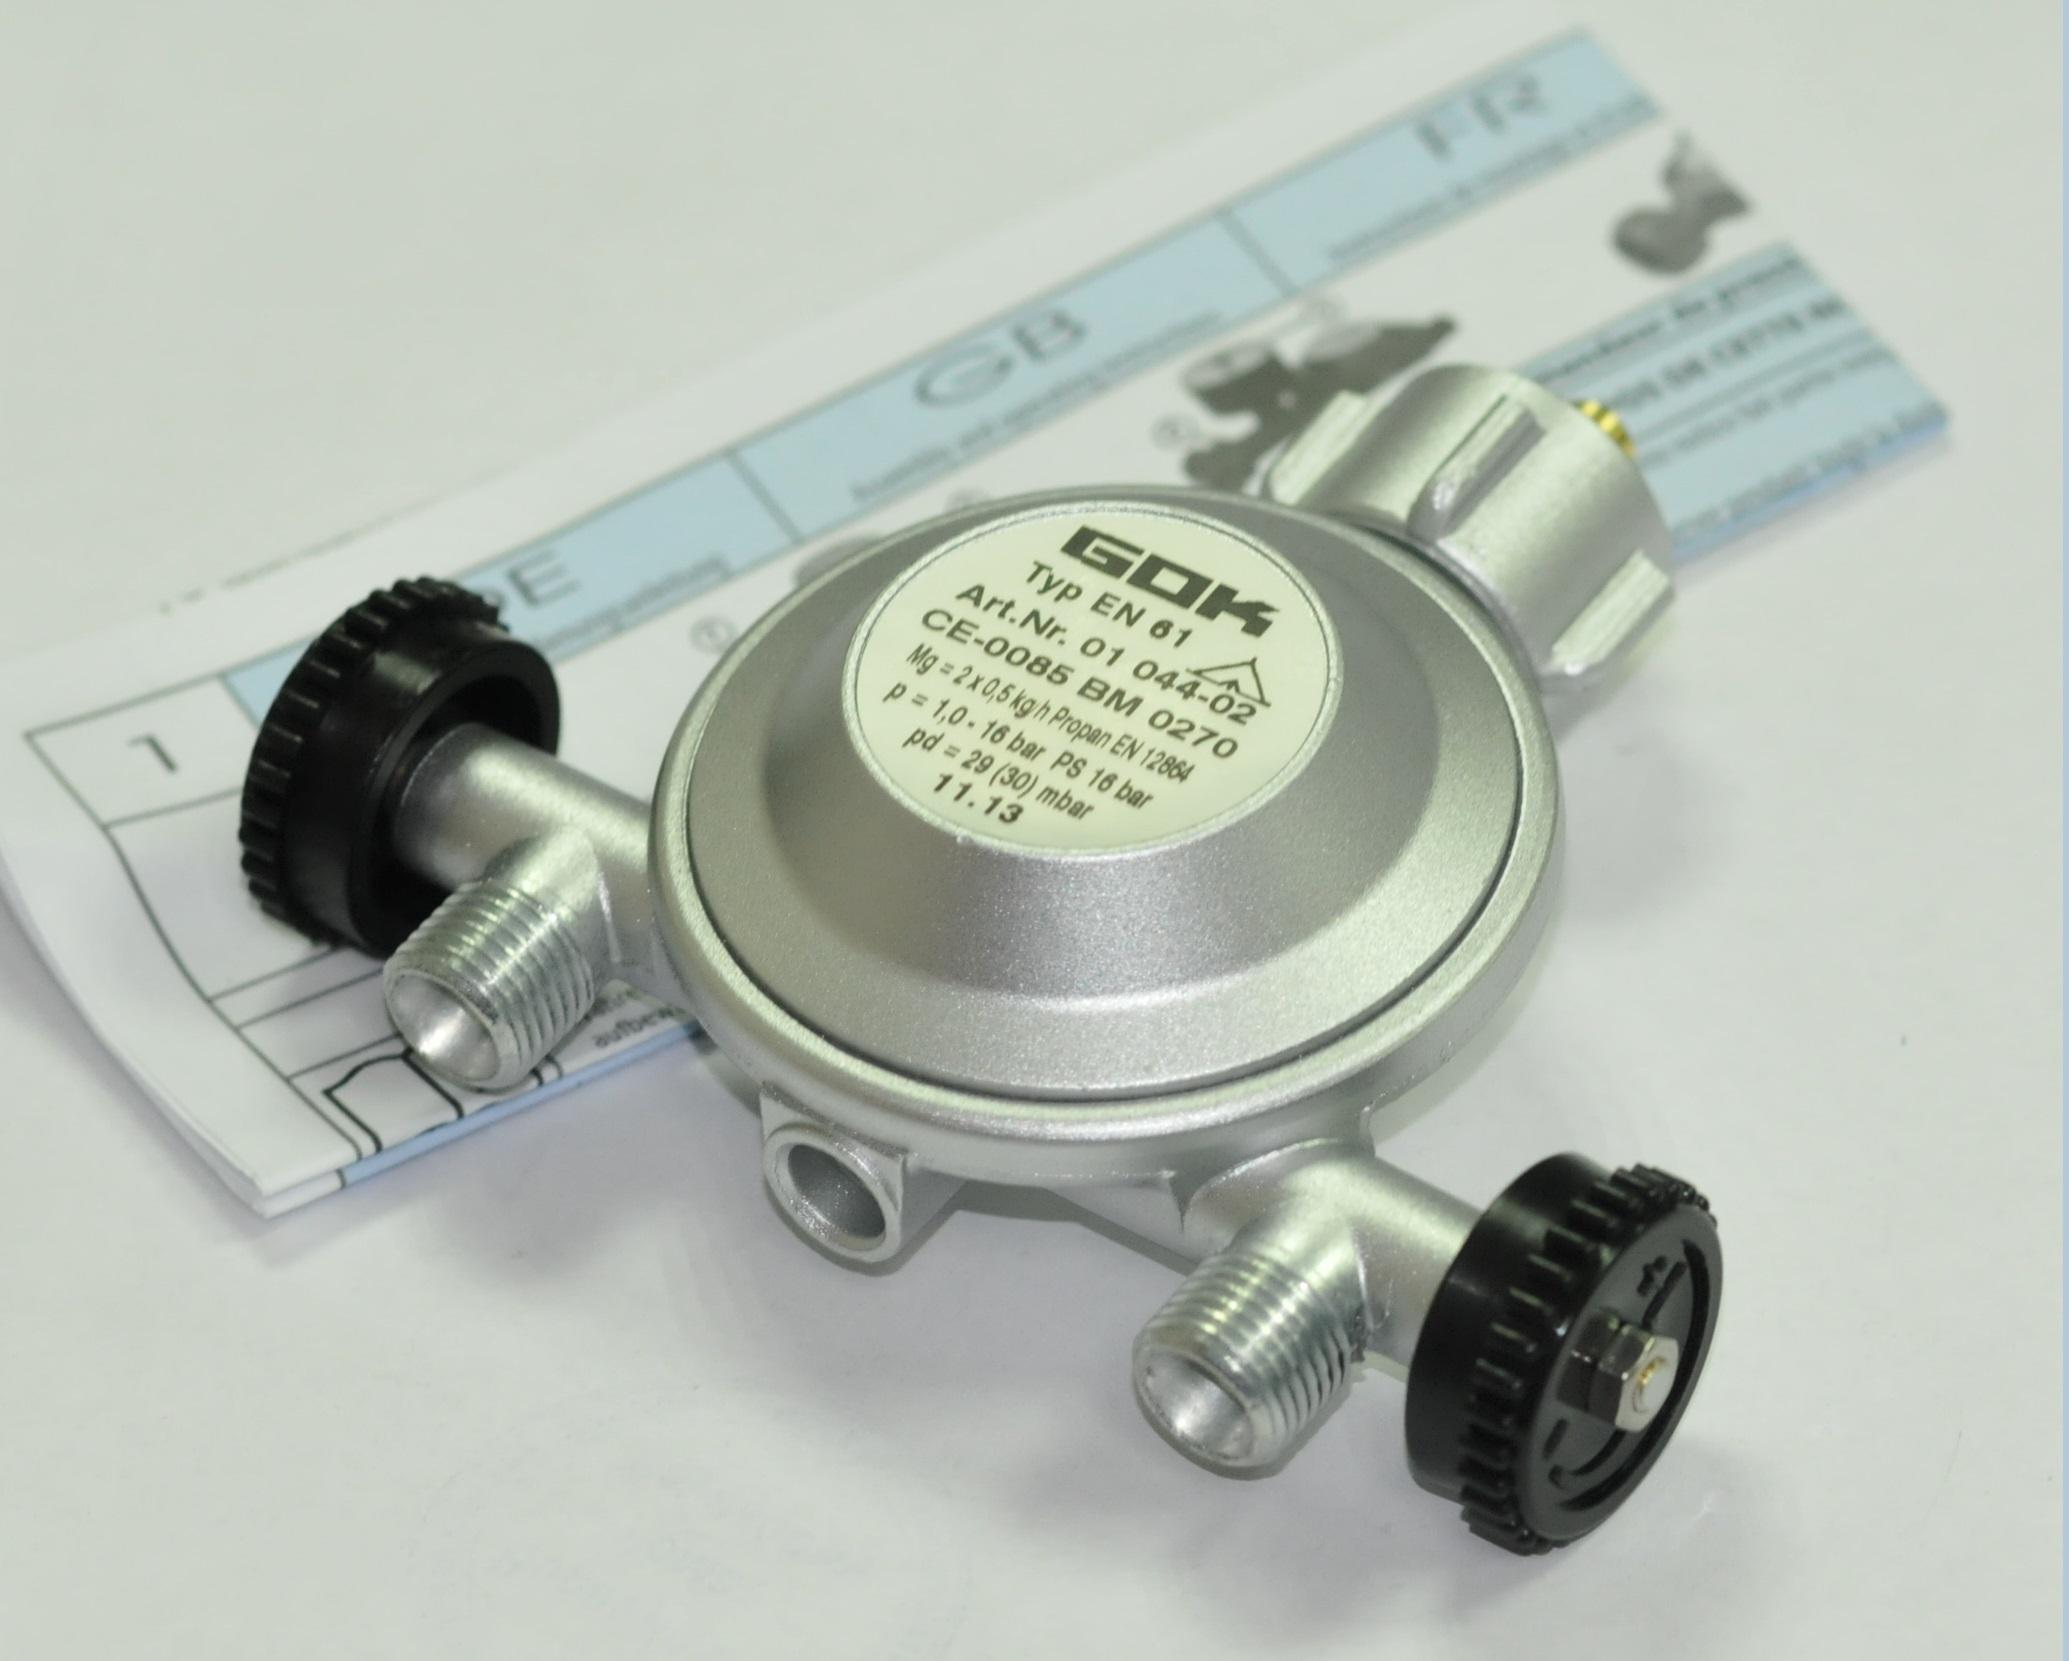 Регулятор давления газа 1кг/час 29(30)мбар PS16бар KLFx2-отв. G1/4LH-KN